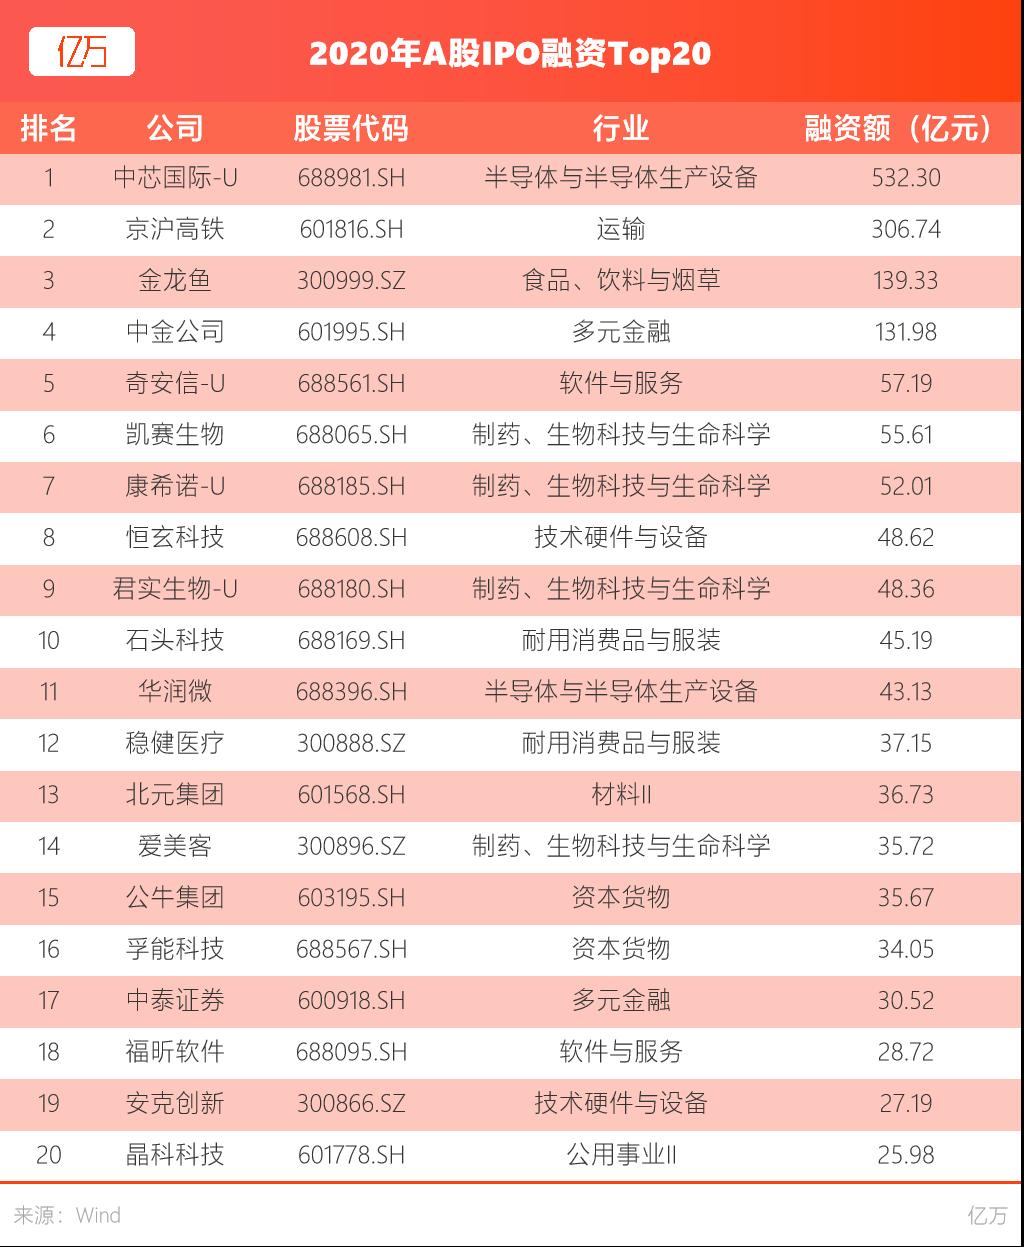 亿万:2020年A股IPO融资Top20